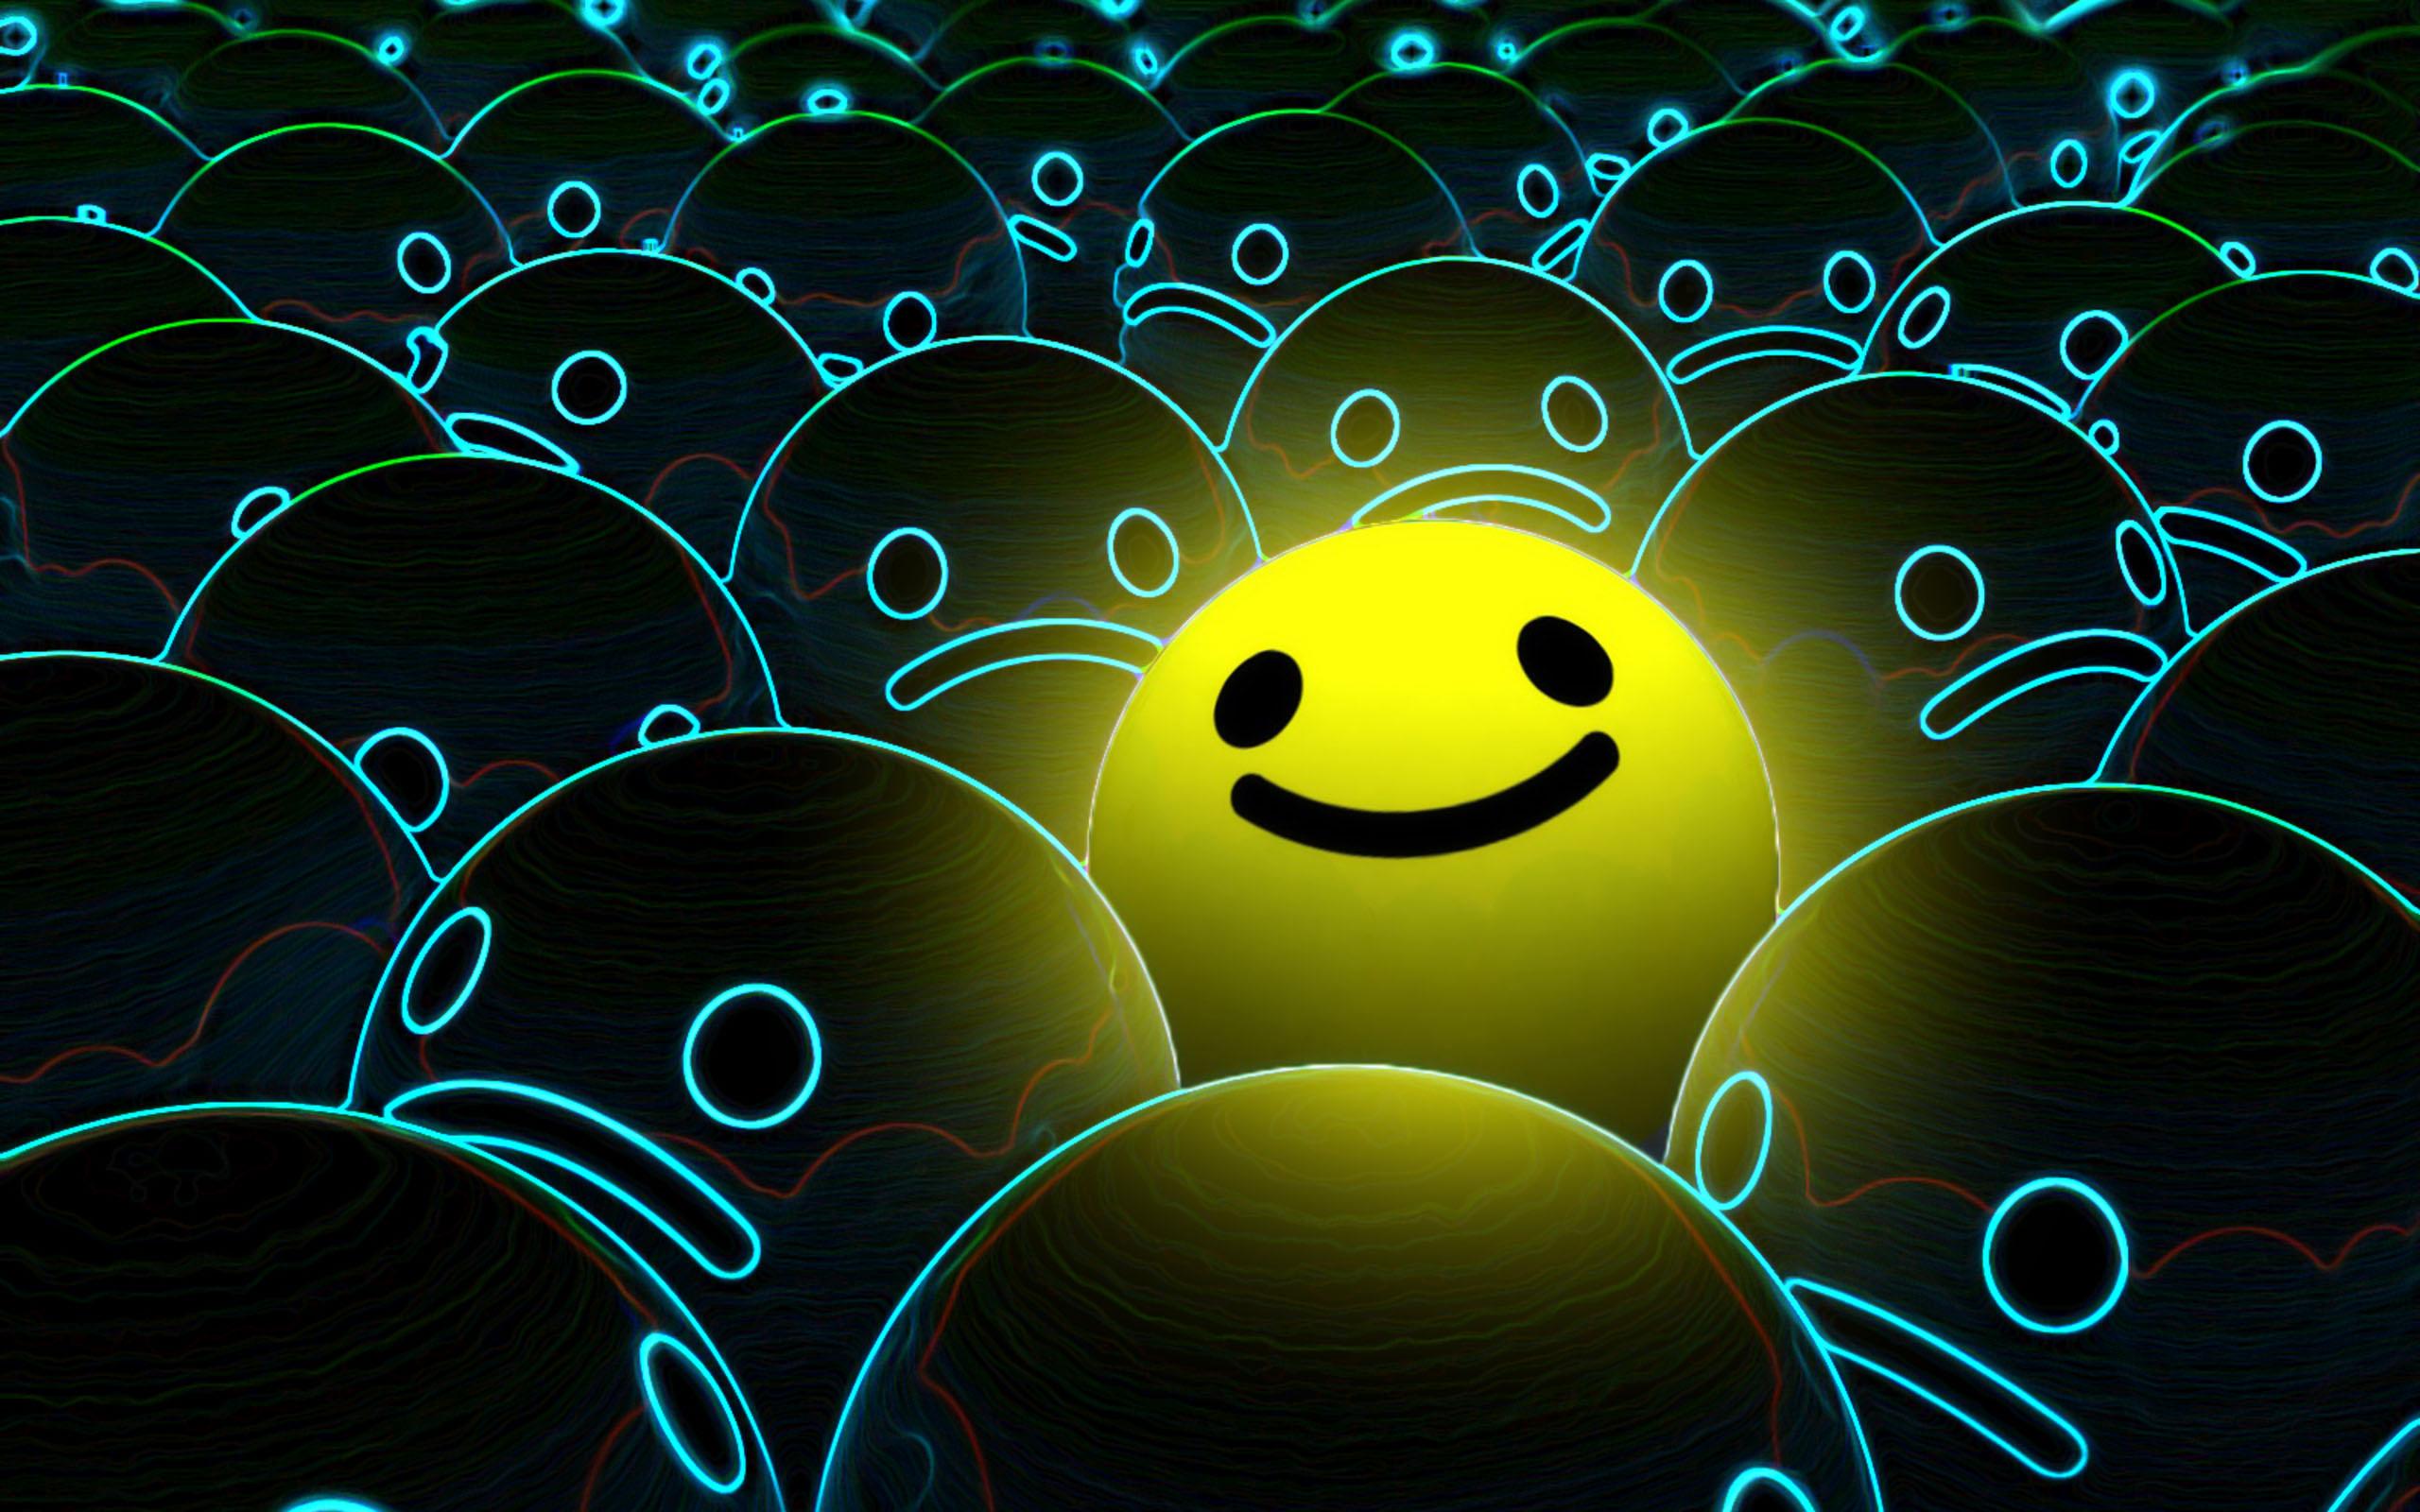 Smiley Face Cool Wallpaper Wallpaper WallpaperLepi 2560x1600